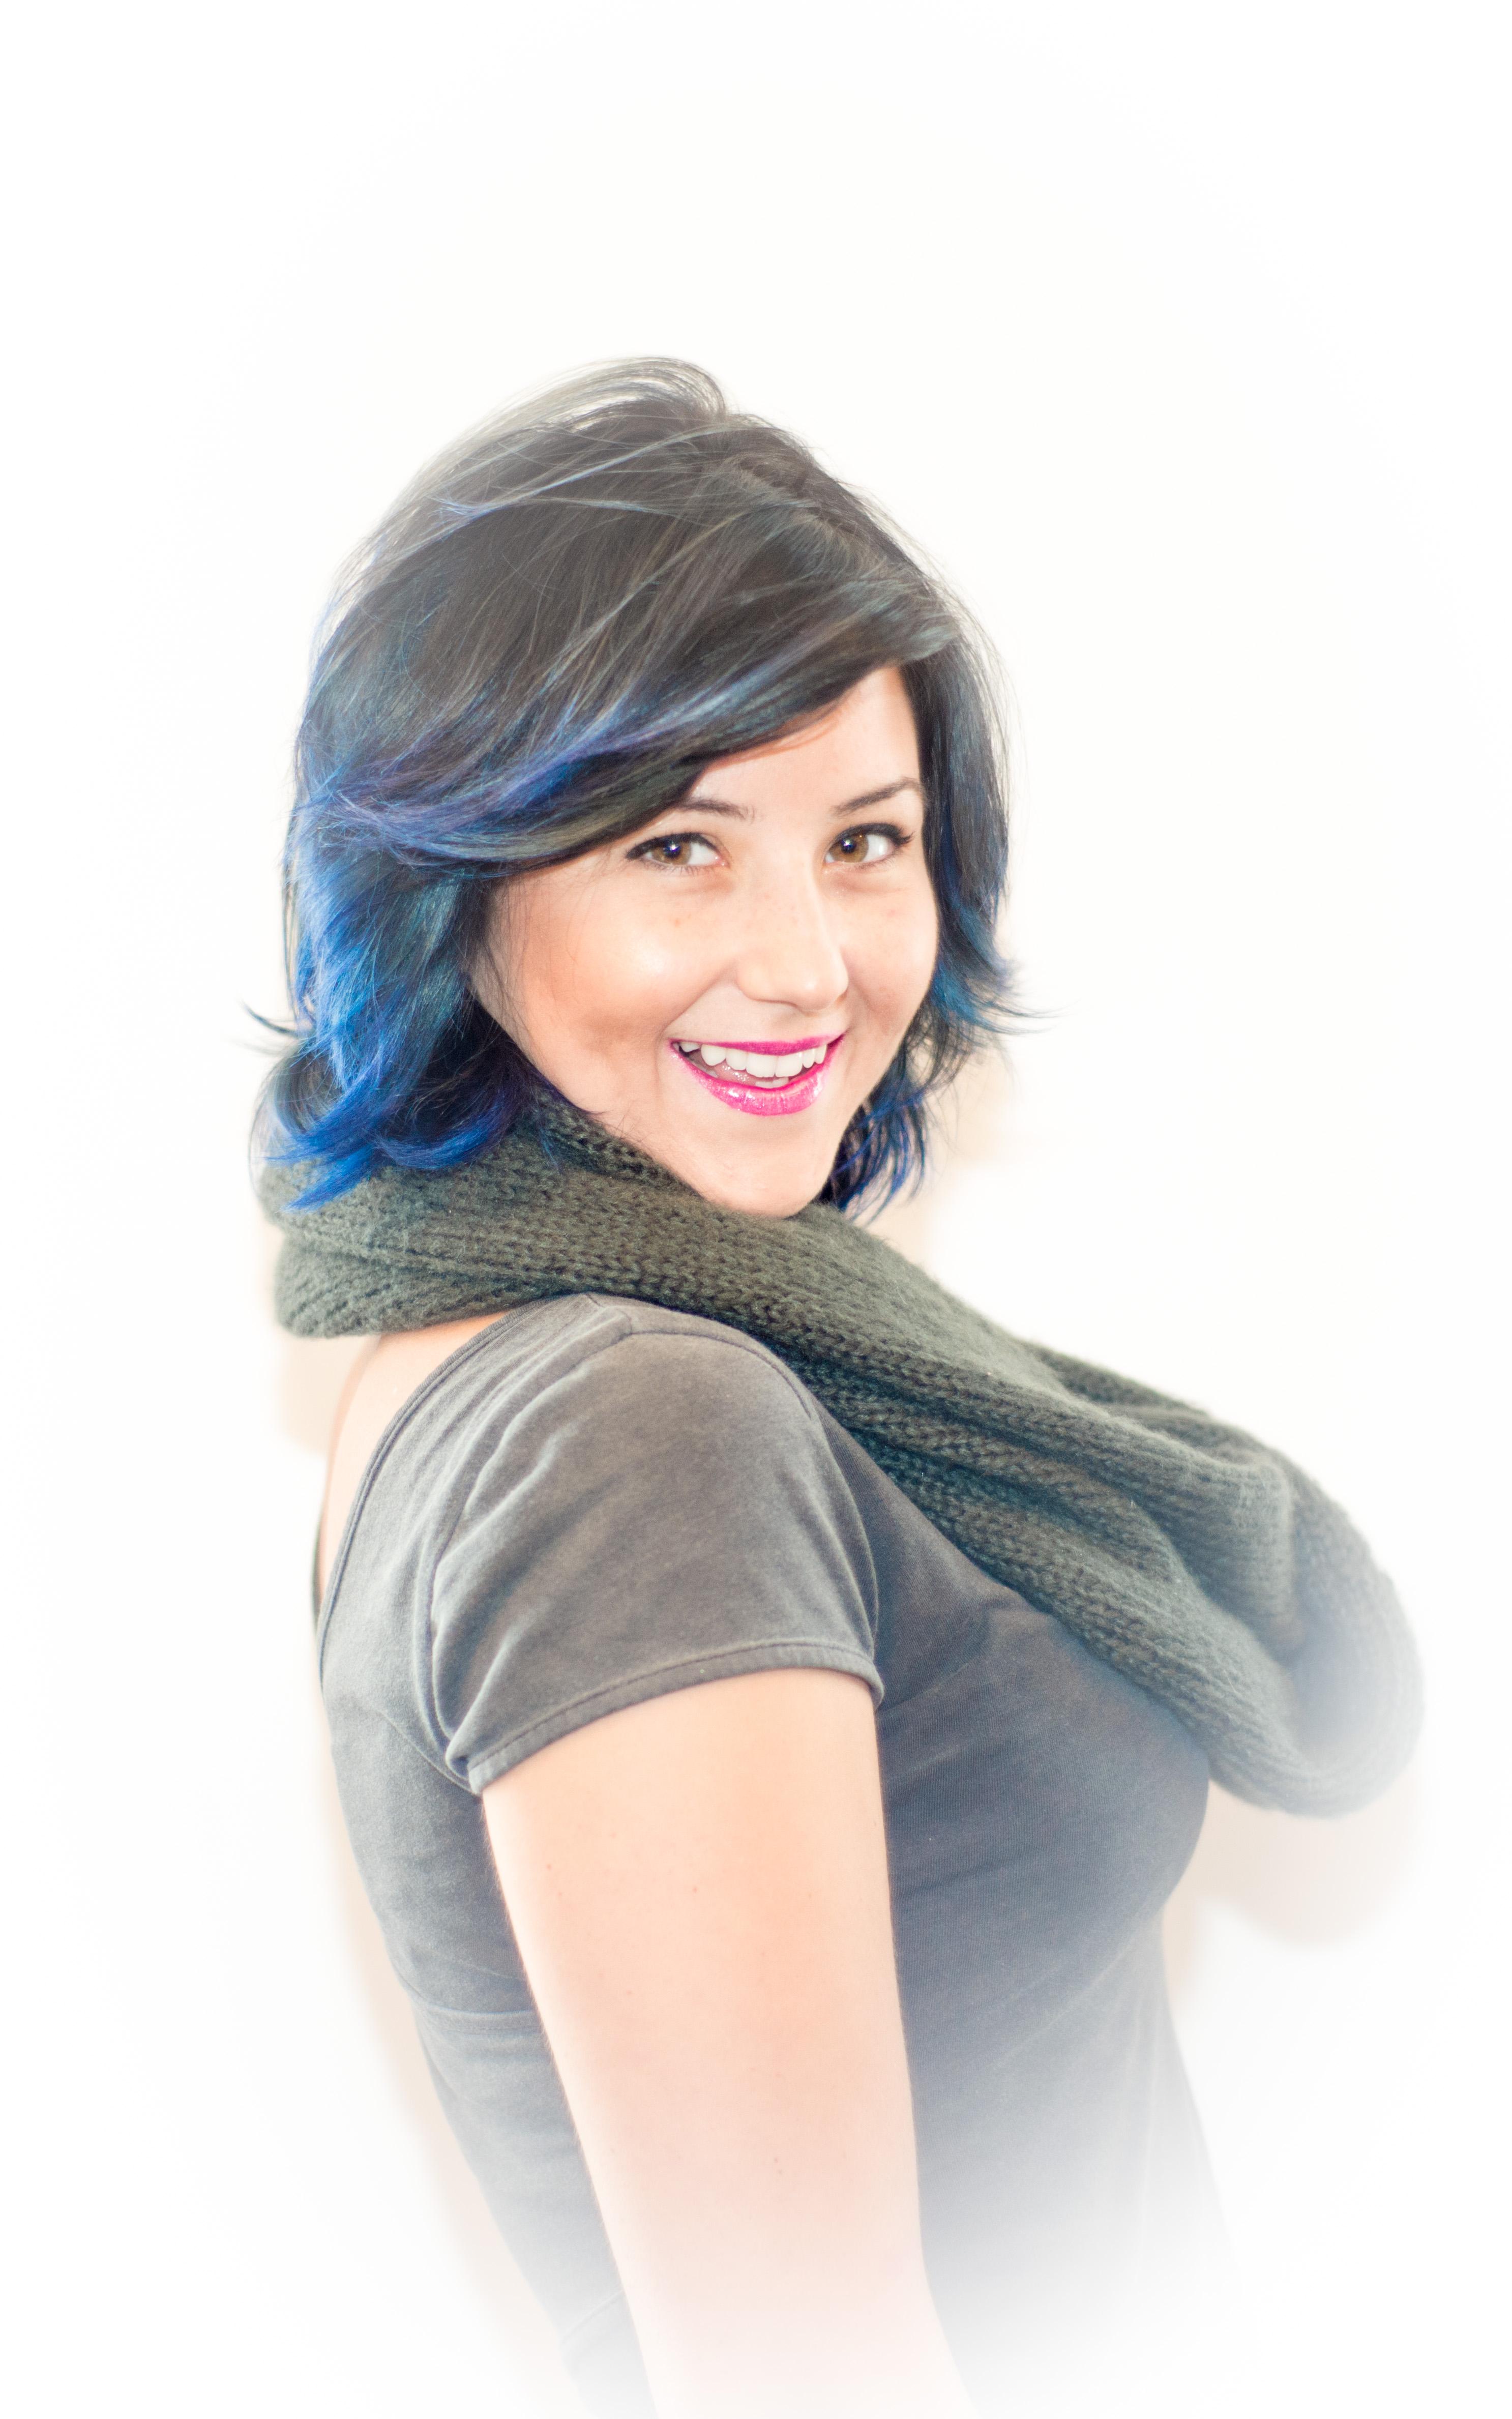 Erica Biafore